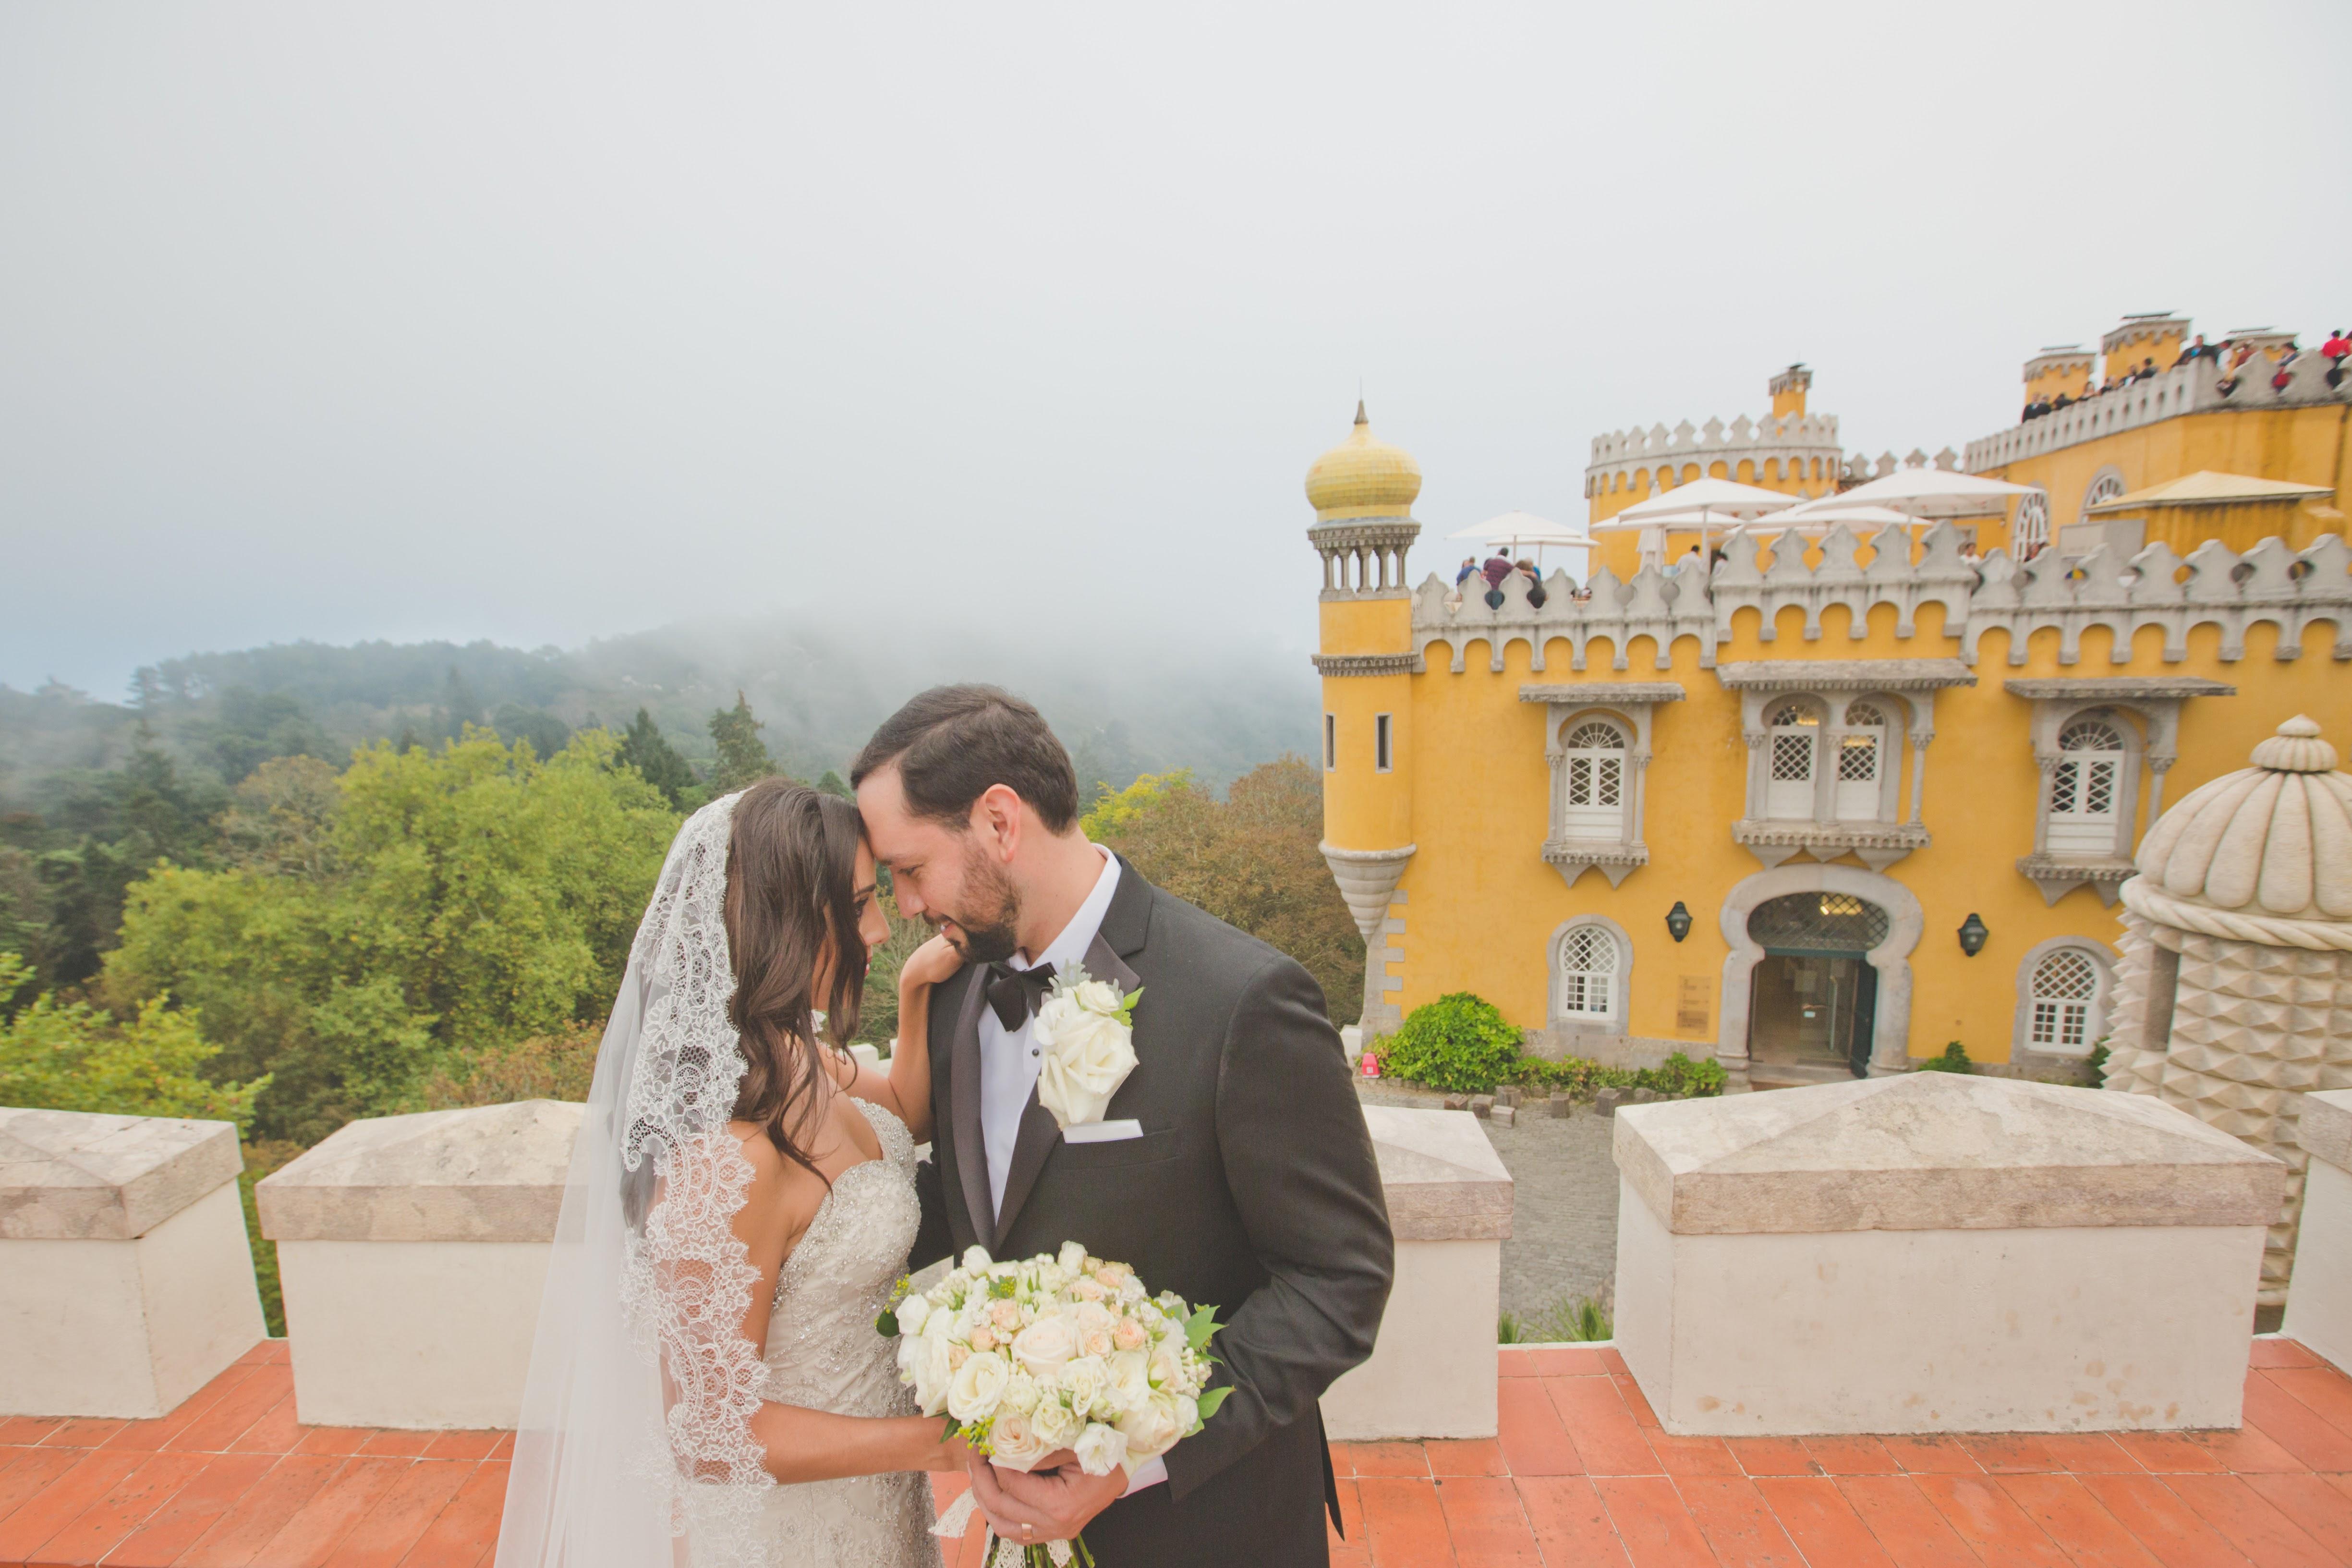 Wedding Venues Portugal | Best Castles and Palaces | Cascais |